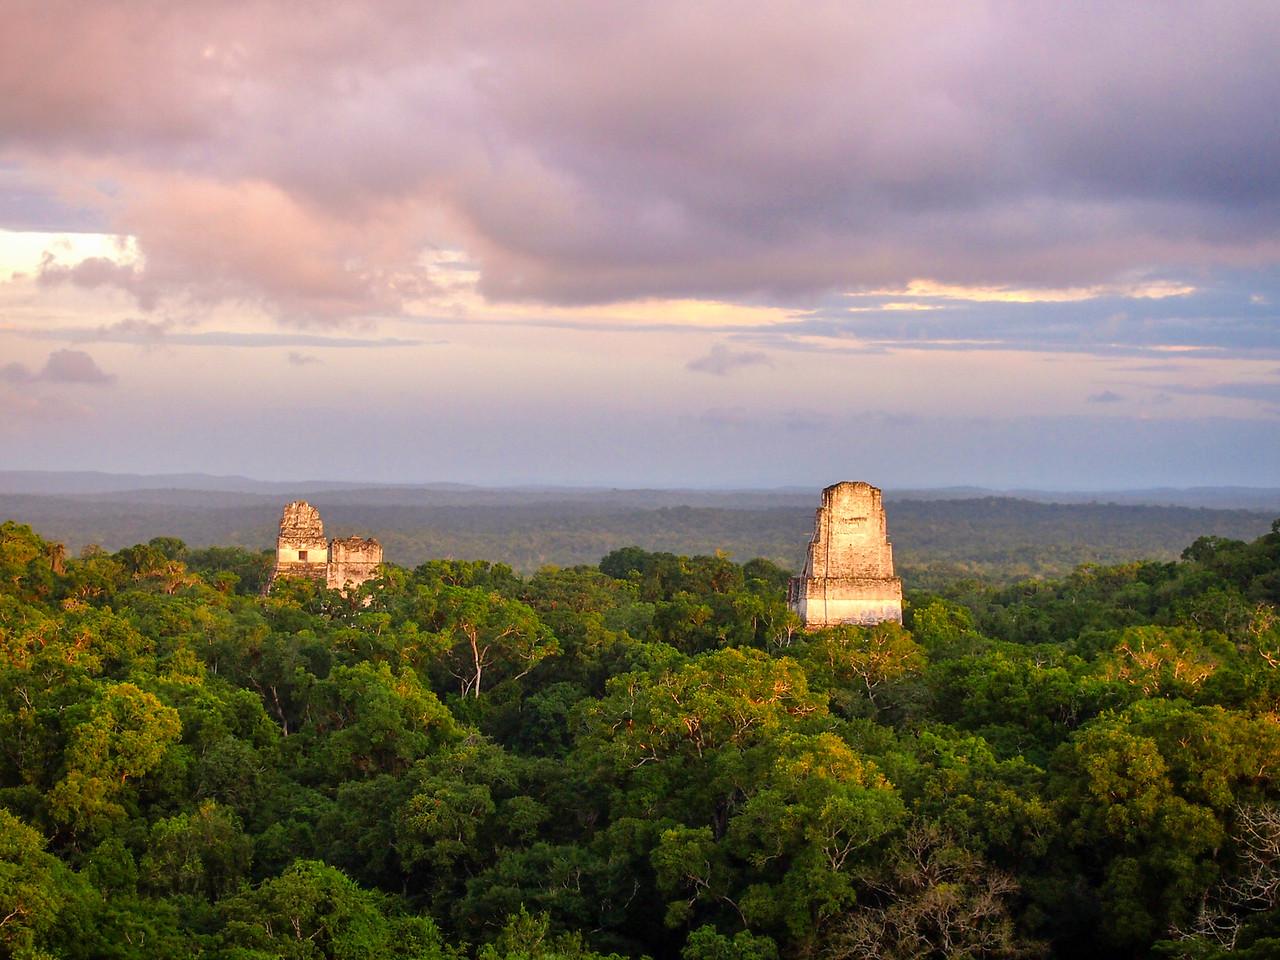 Sunset at Tikal in Guatemala